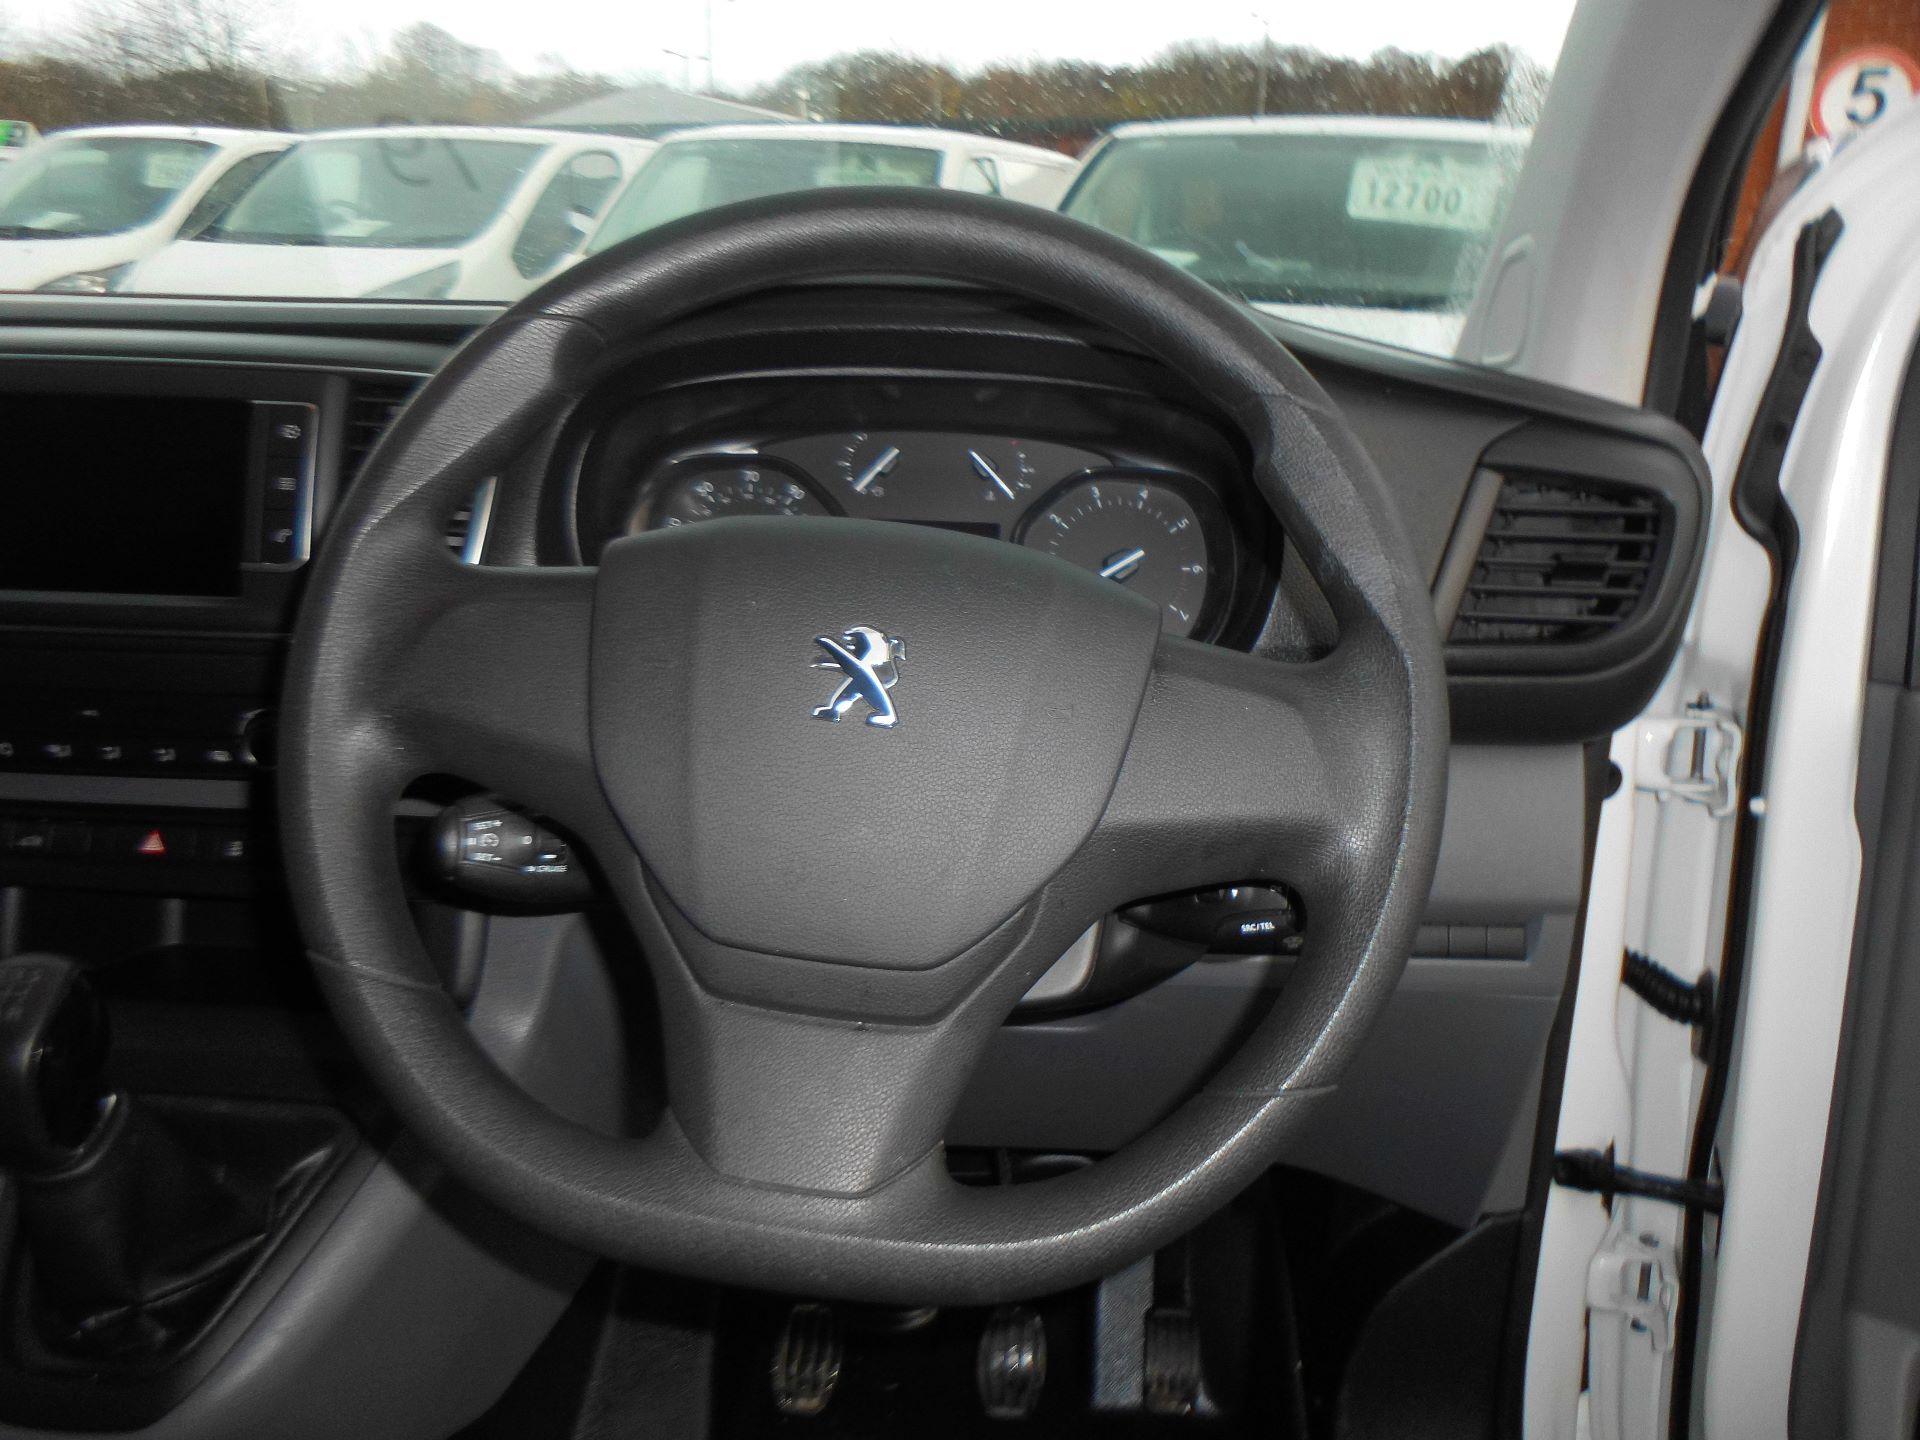 2018 Peugeot Expert STANDARD 1000 1.6 BLUEHDI 95 PROFESSIONAL EURO 6 (NU68GXX) Image 8